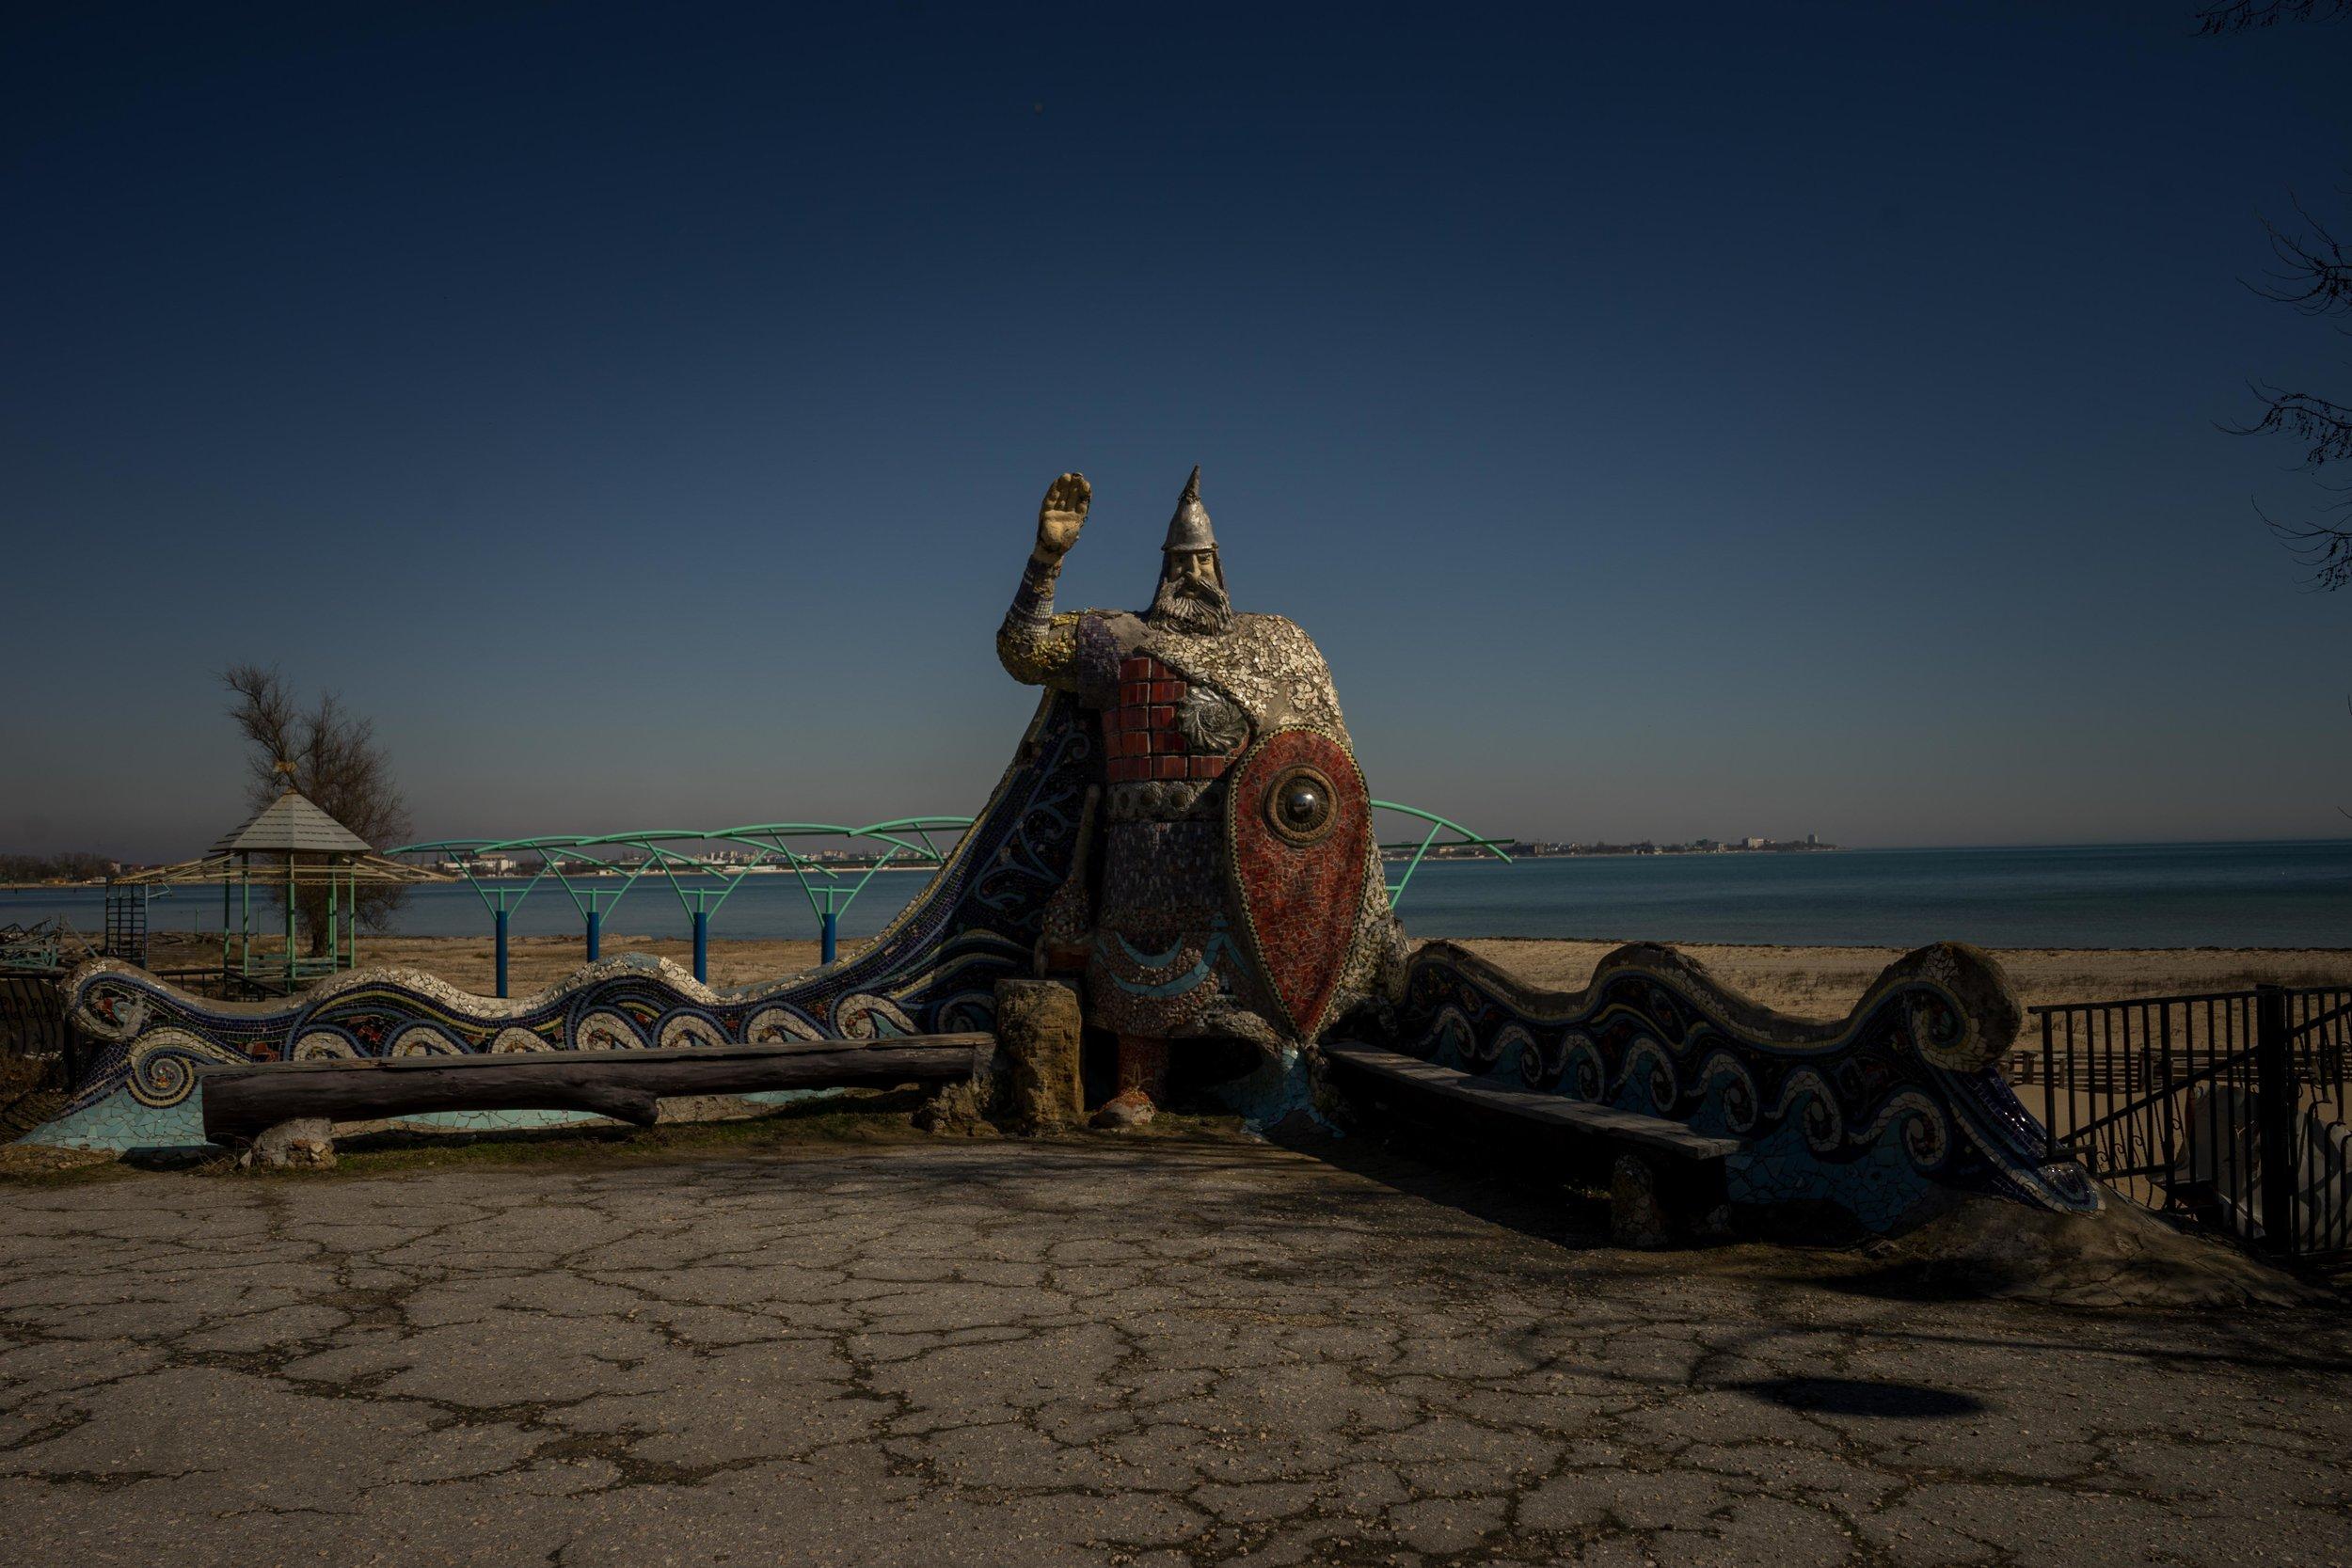 Hero of Russian folk tales on the city embankment, Yevpatoria, Crimea